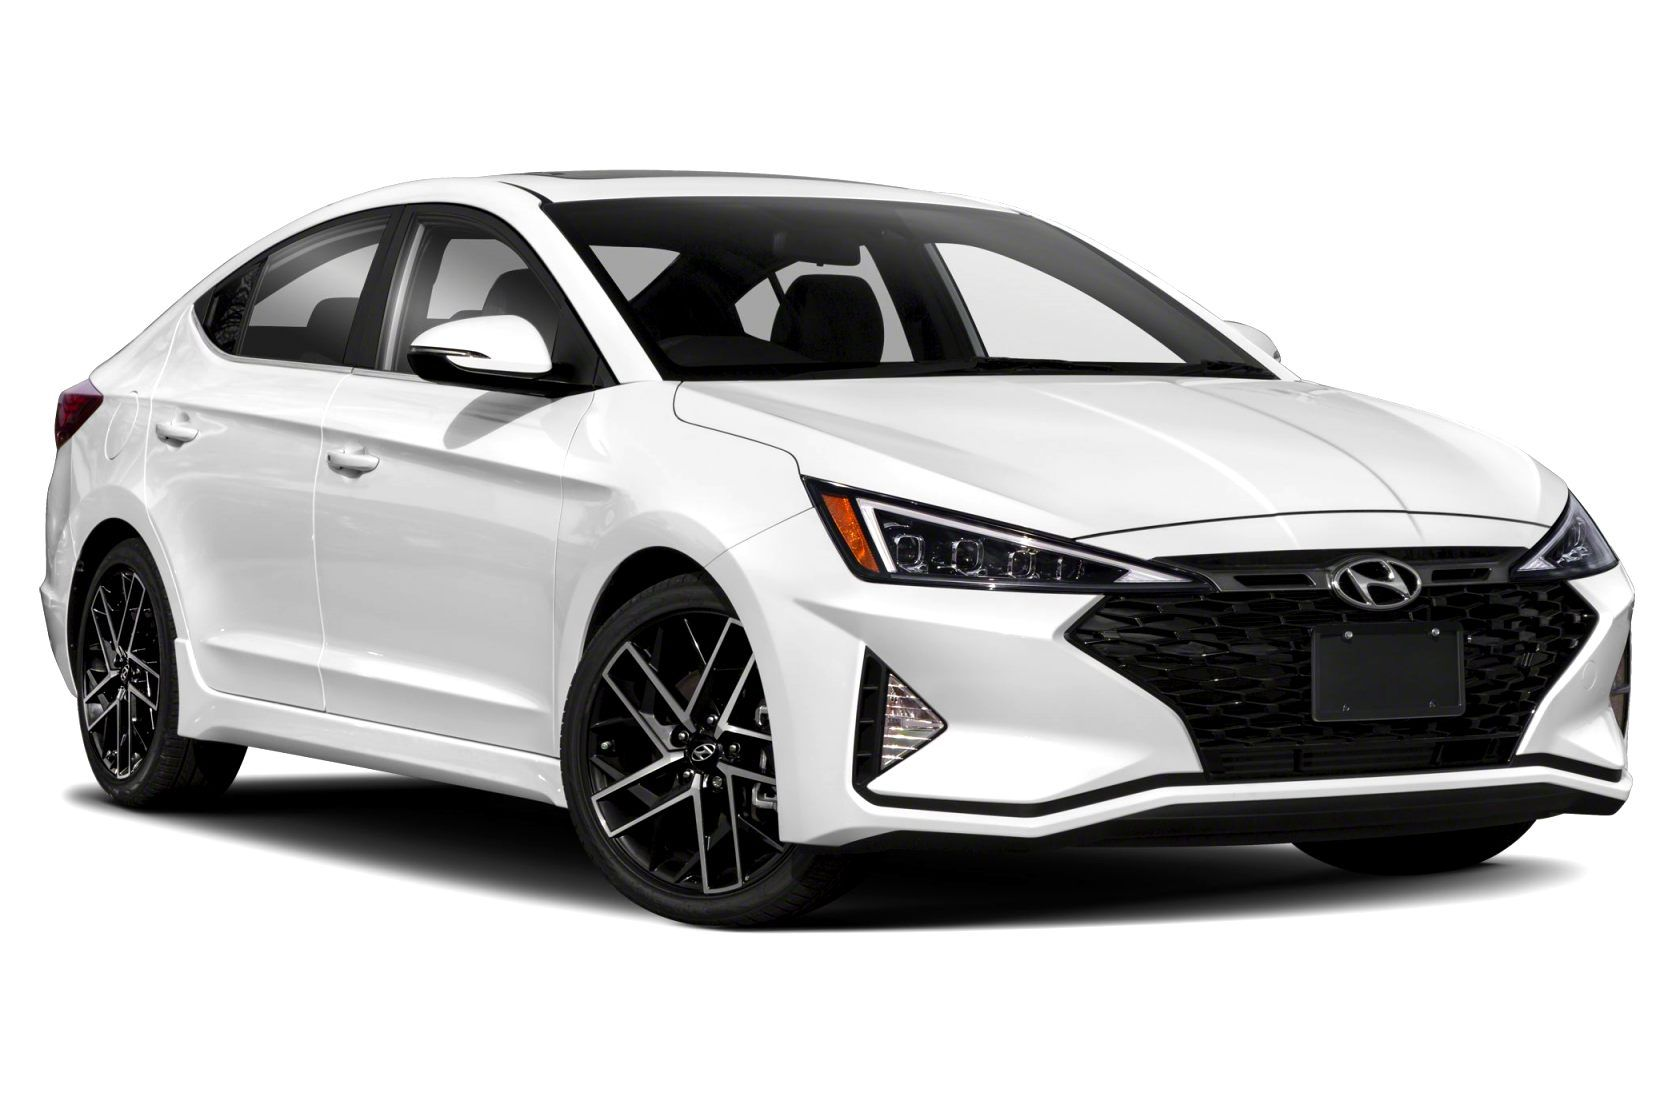 Hyundai Elantra Sport 2020 Release Date And Concept Hyundai Elantra Elantra Hyundai